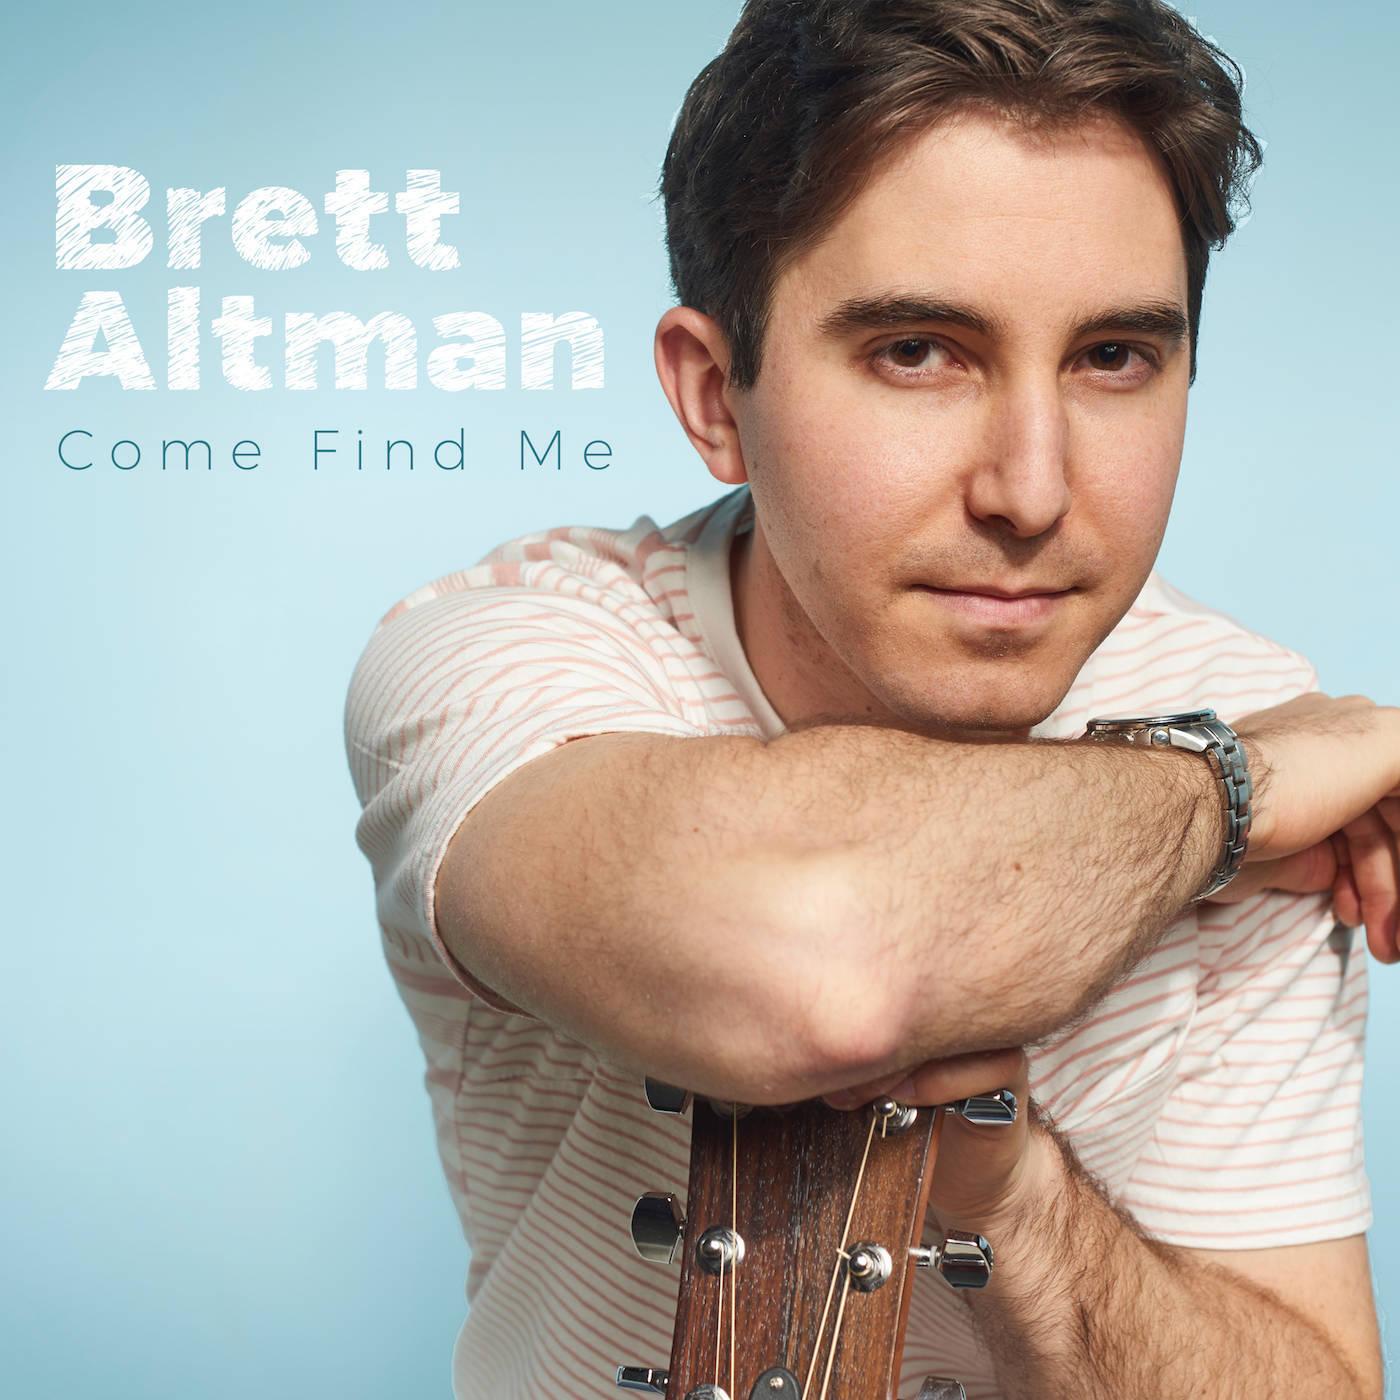 5ff35fe52952186bf14f_Brett_Altman_Come_Find_Me__1400_pixels_.jpeg